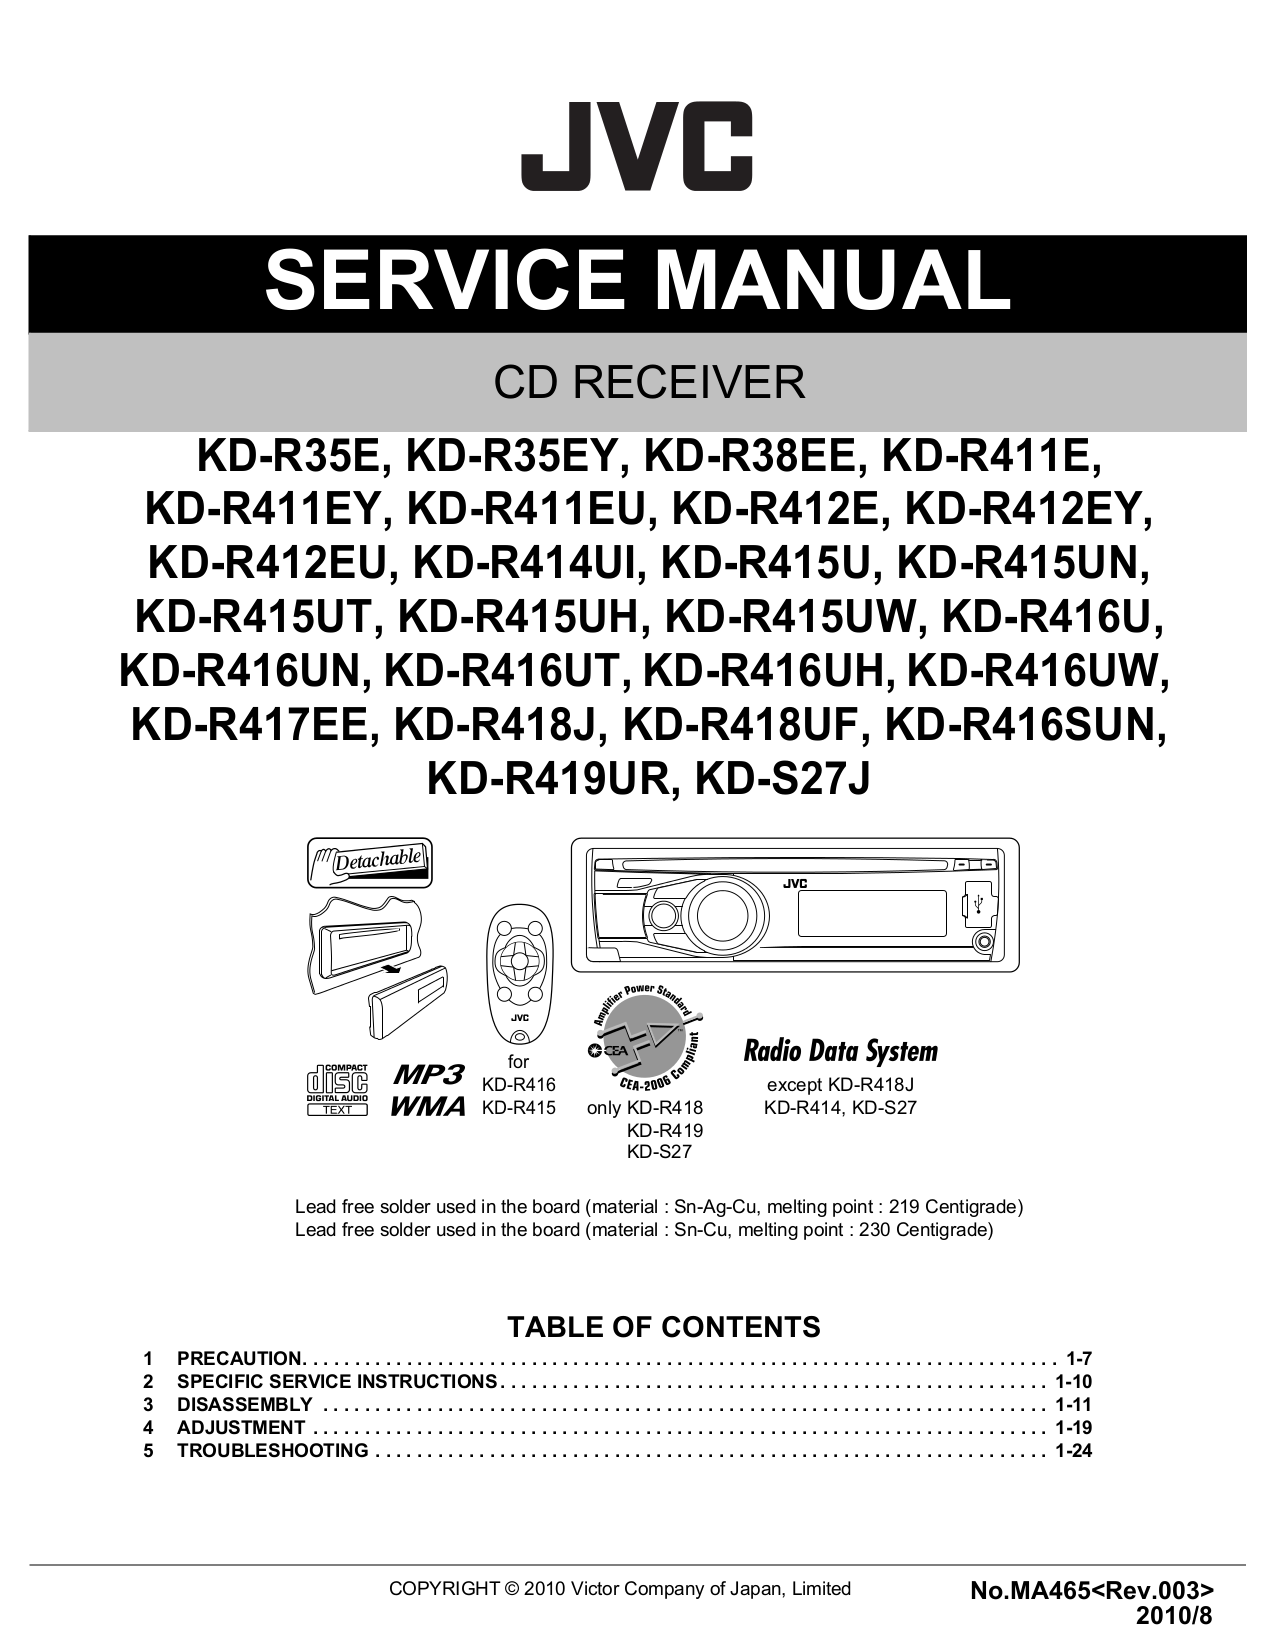 download free pdf for jvc kd r520 car receiver manual rh umlib com jvc kd r520 manual en español jvc kd-r520 manual